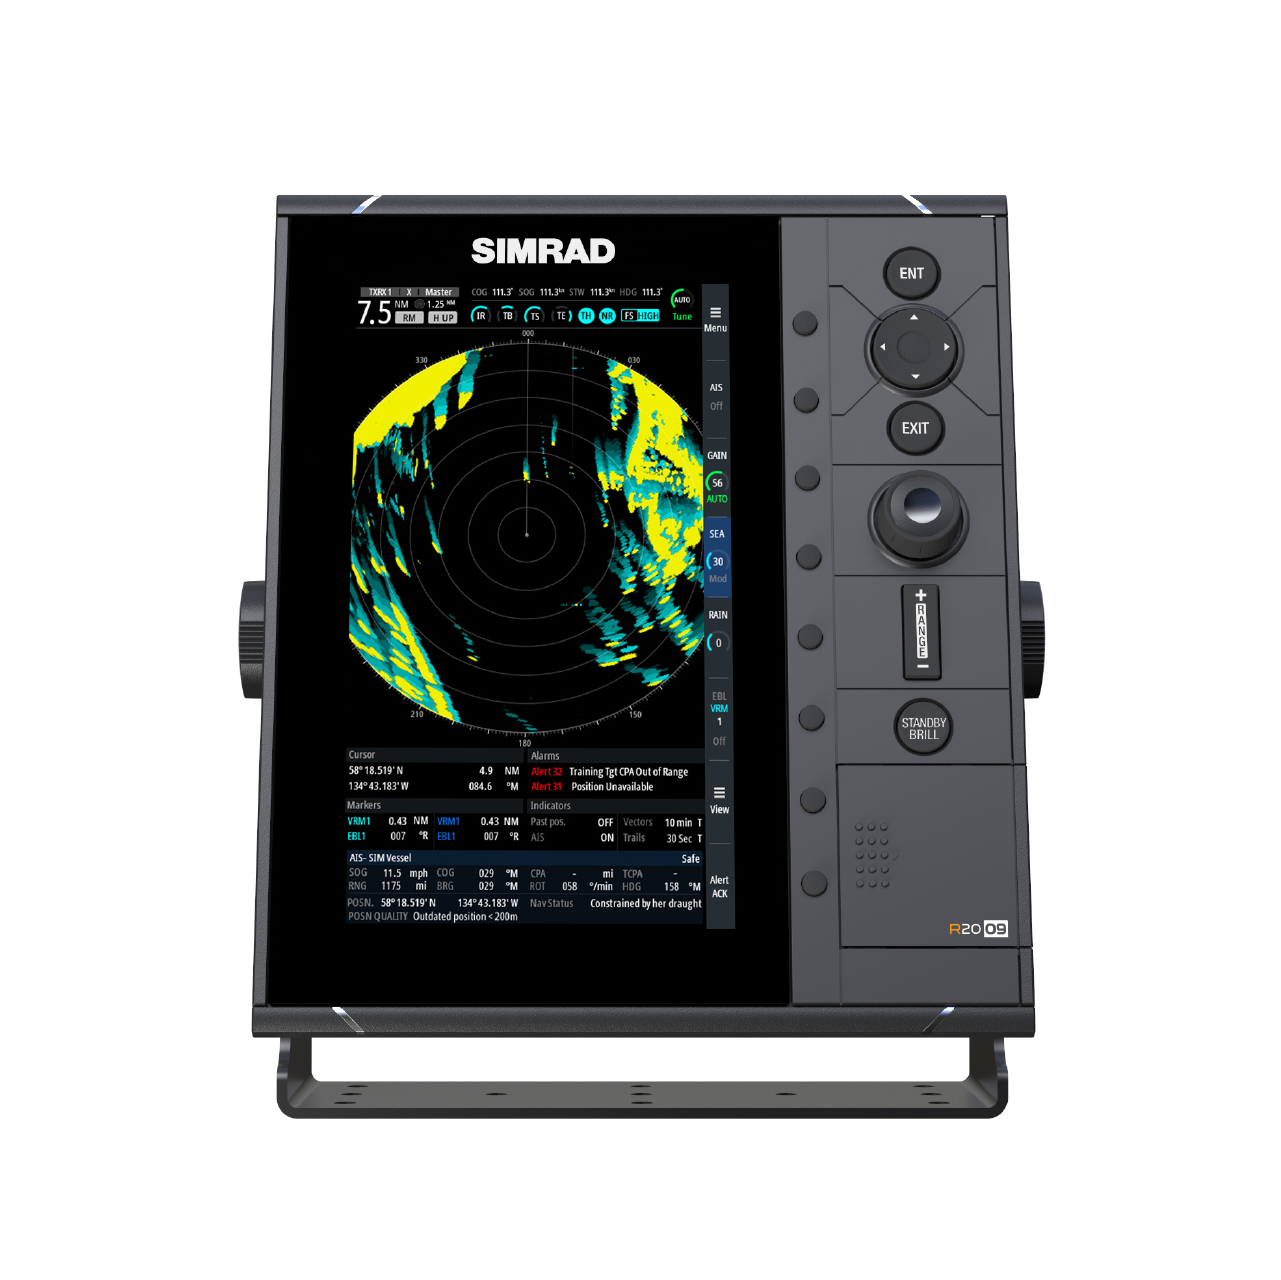 simrad pro marine radar r2009 large front view